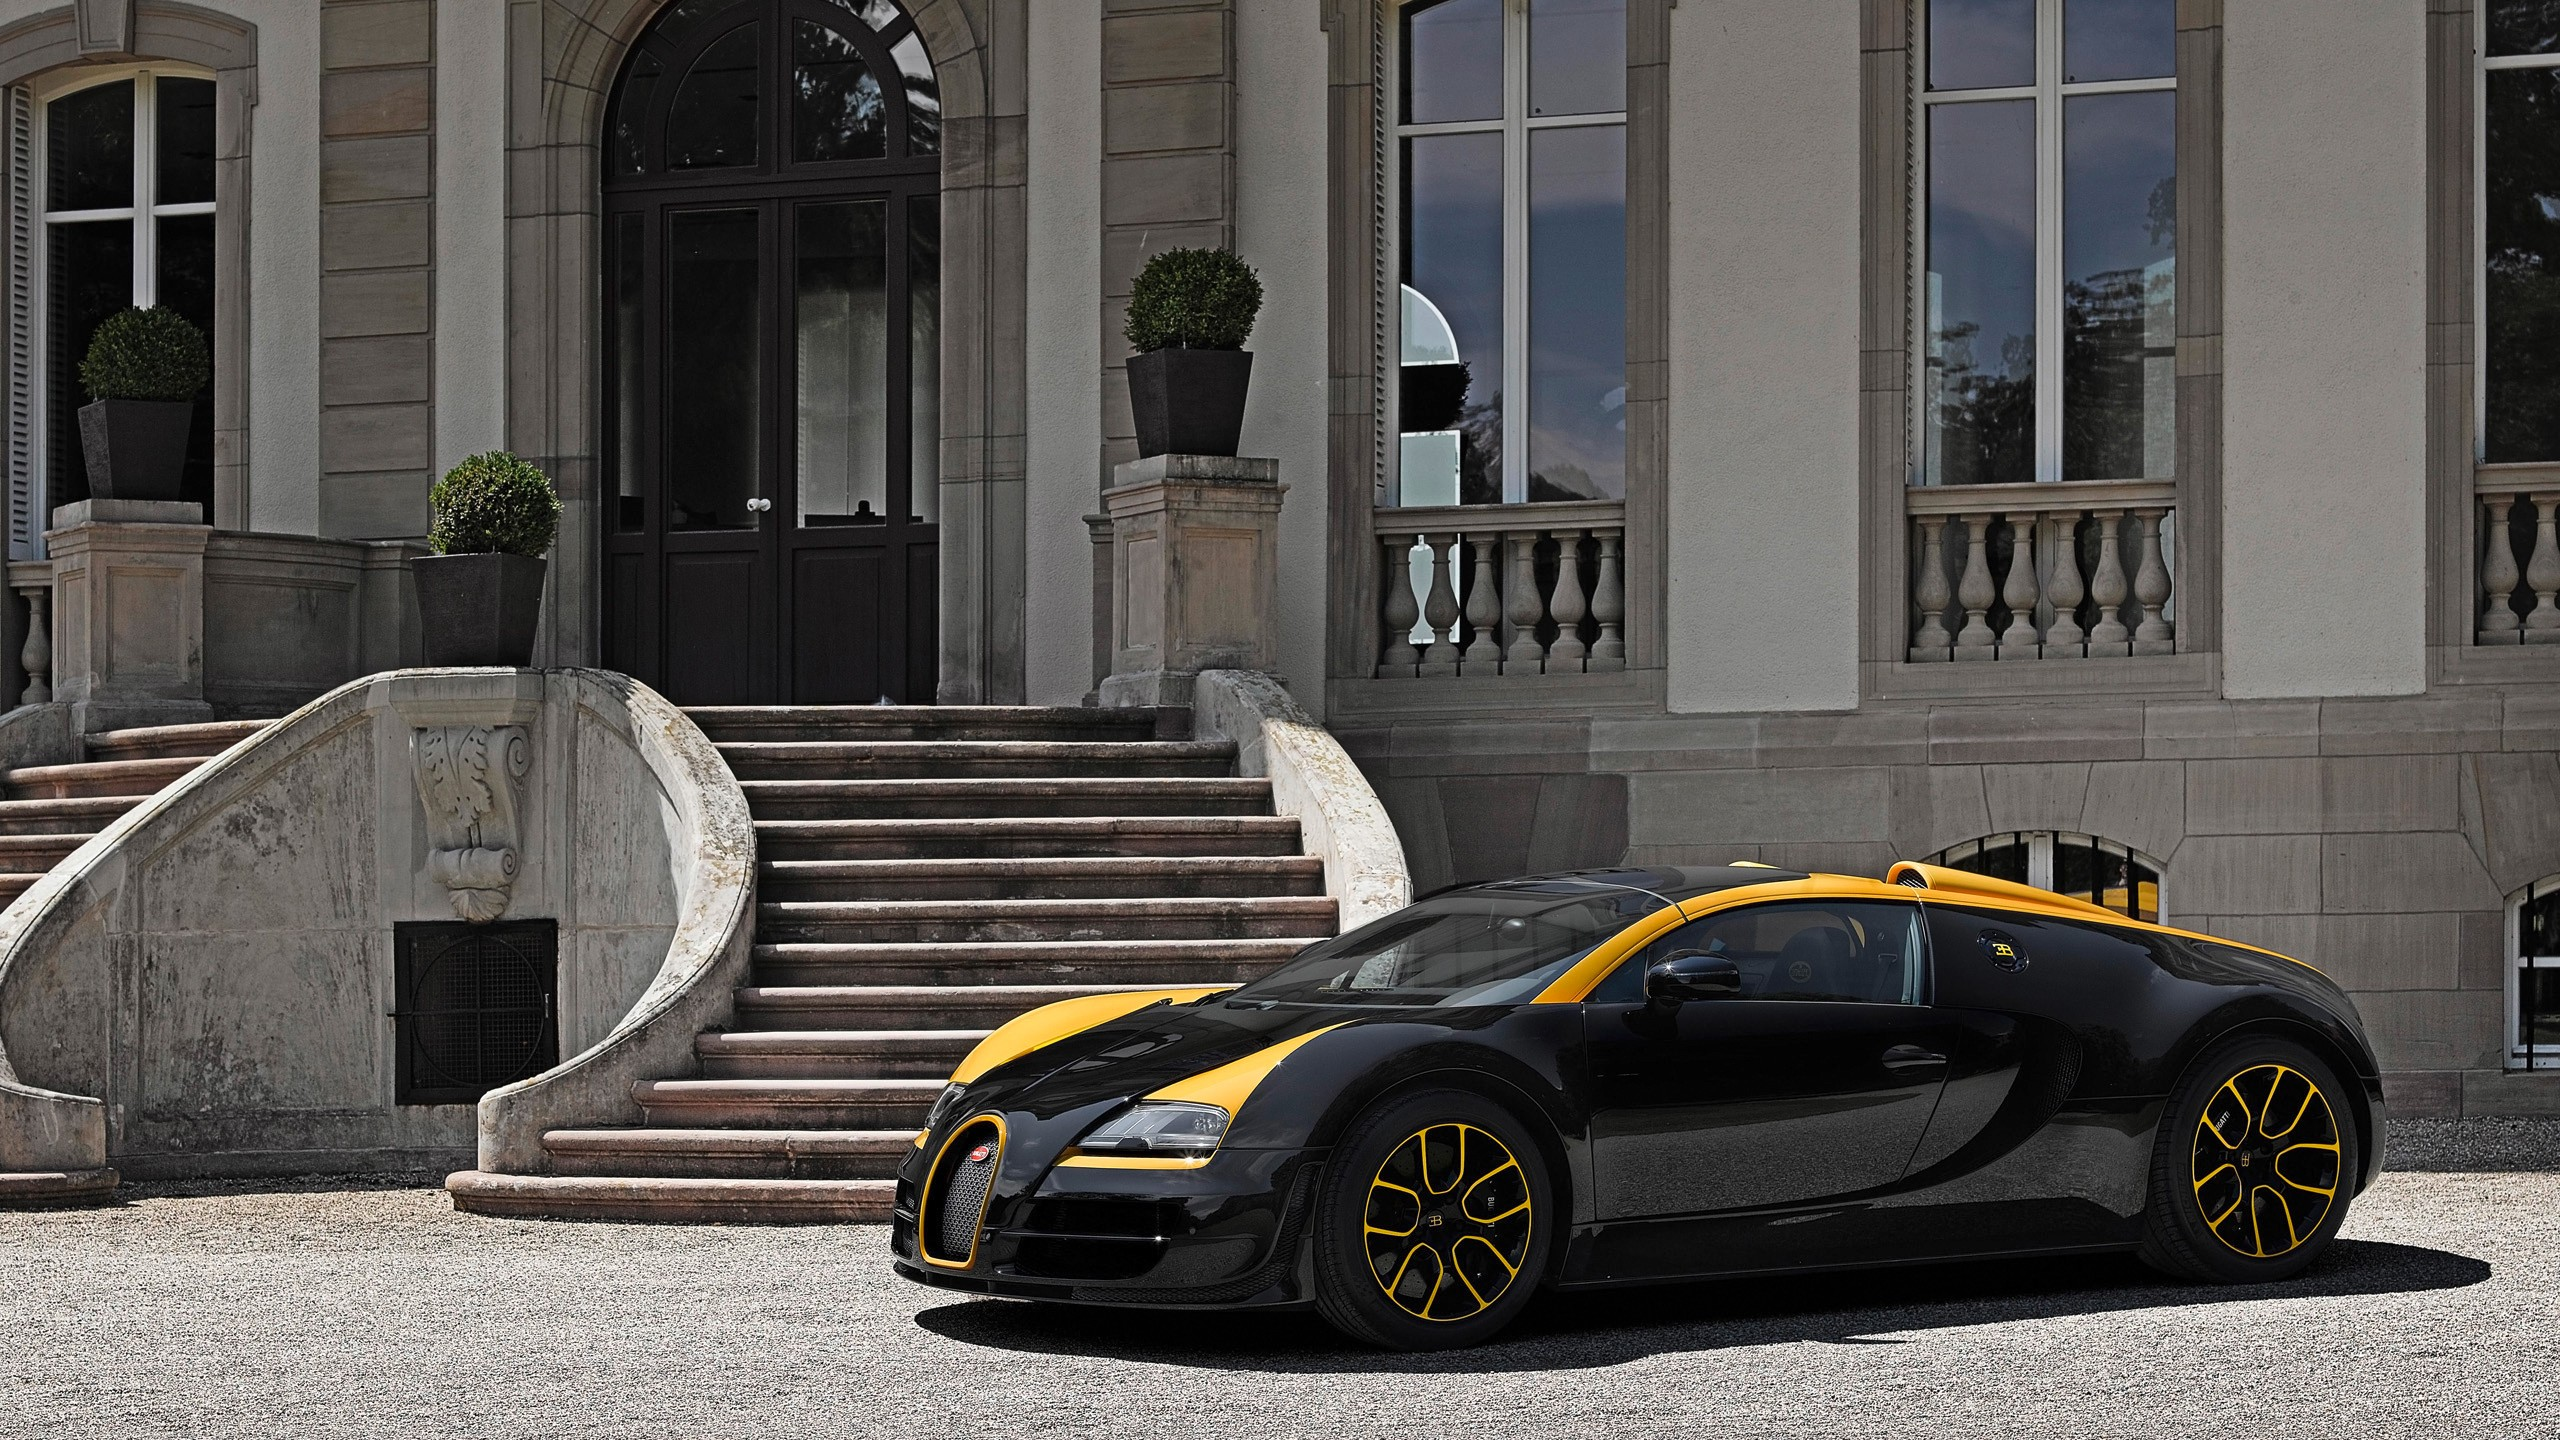 2014 bugatti veyron grand sport vitesse 1 of 1 wallpaper hd car wallpapers. Black Bedroom Furniture Sets. Home Design Ideas